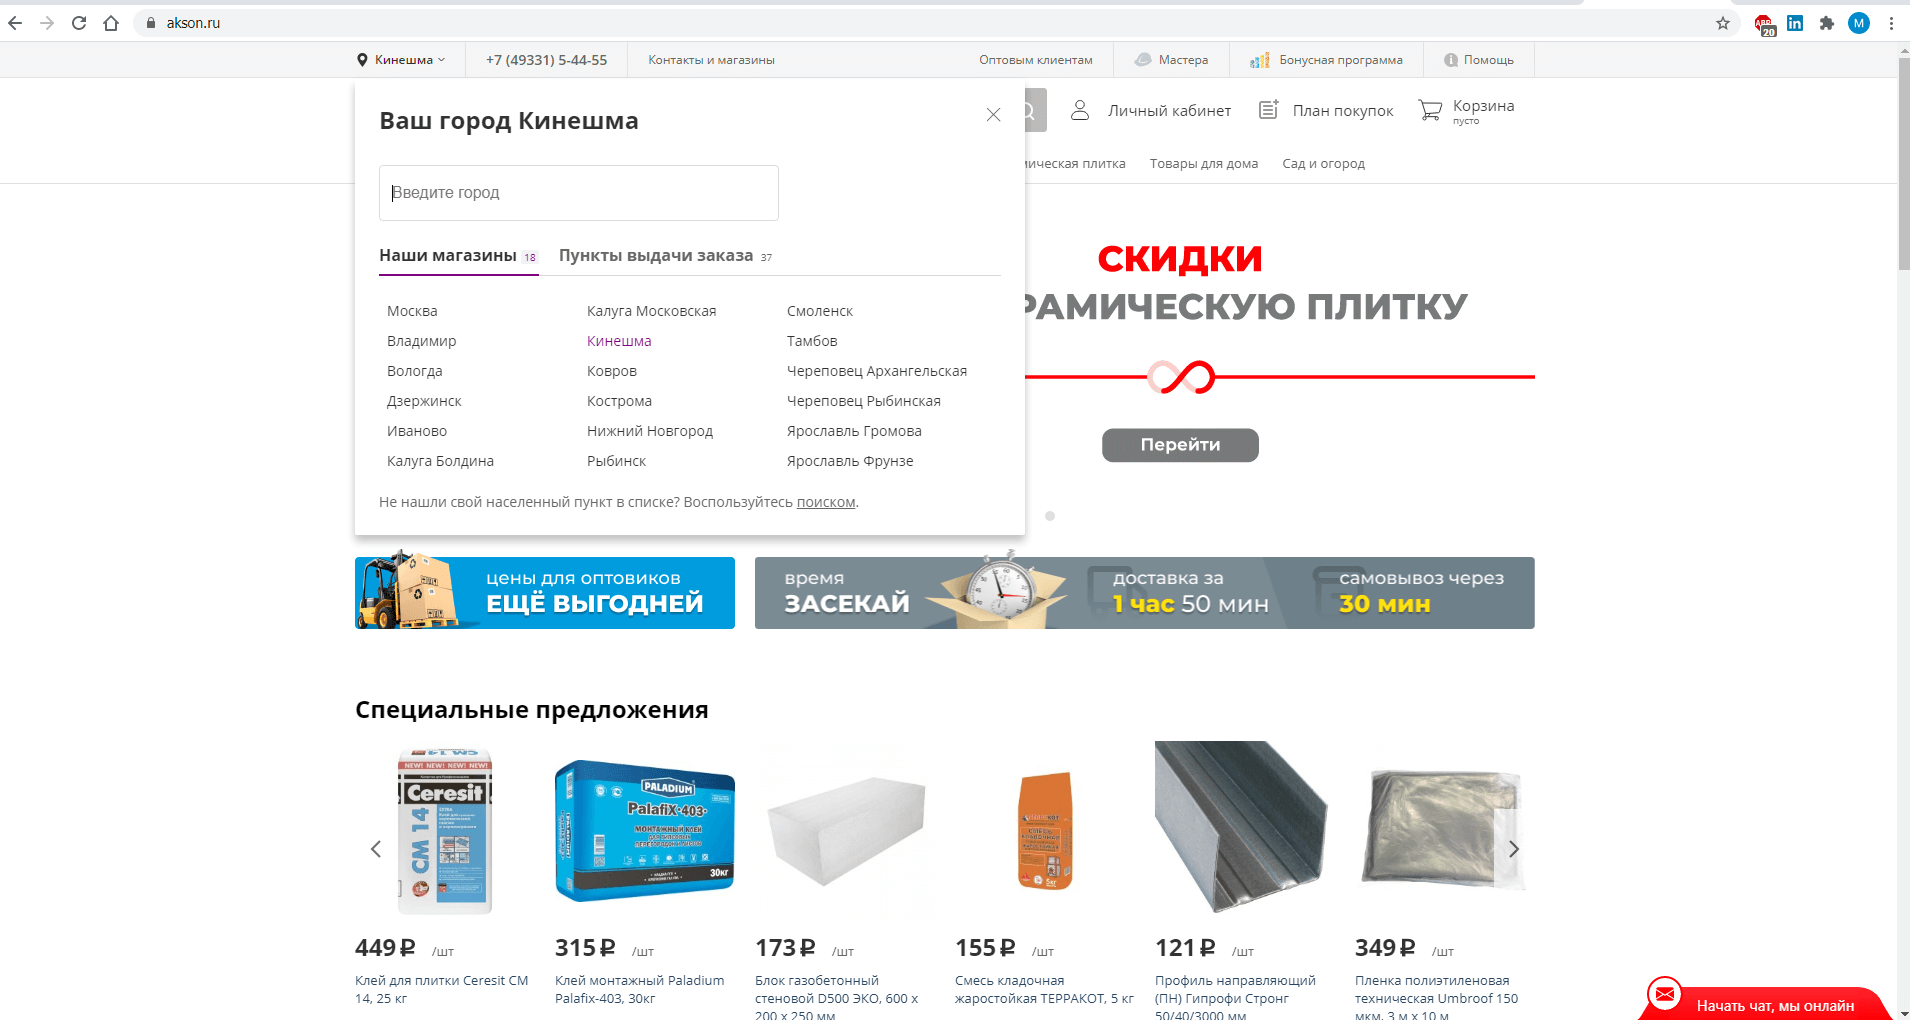 akson.ru website